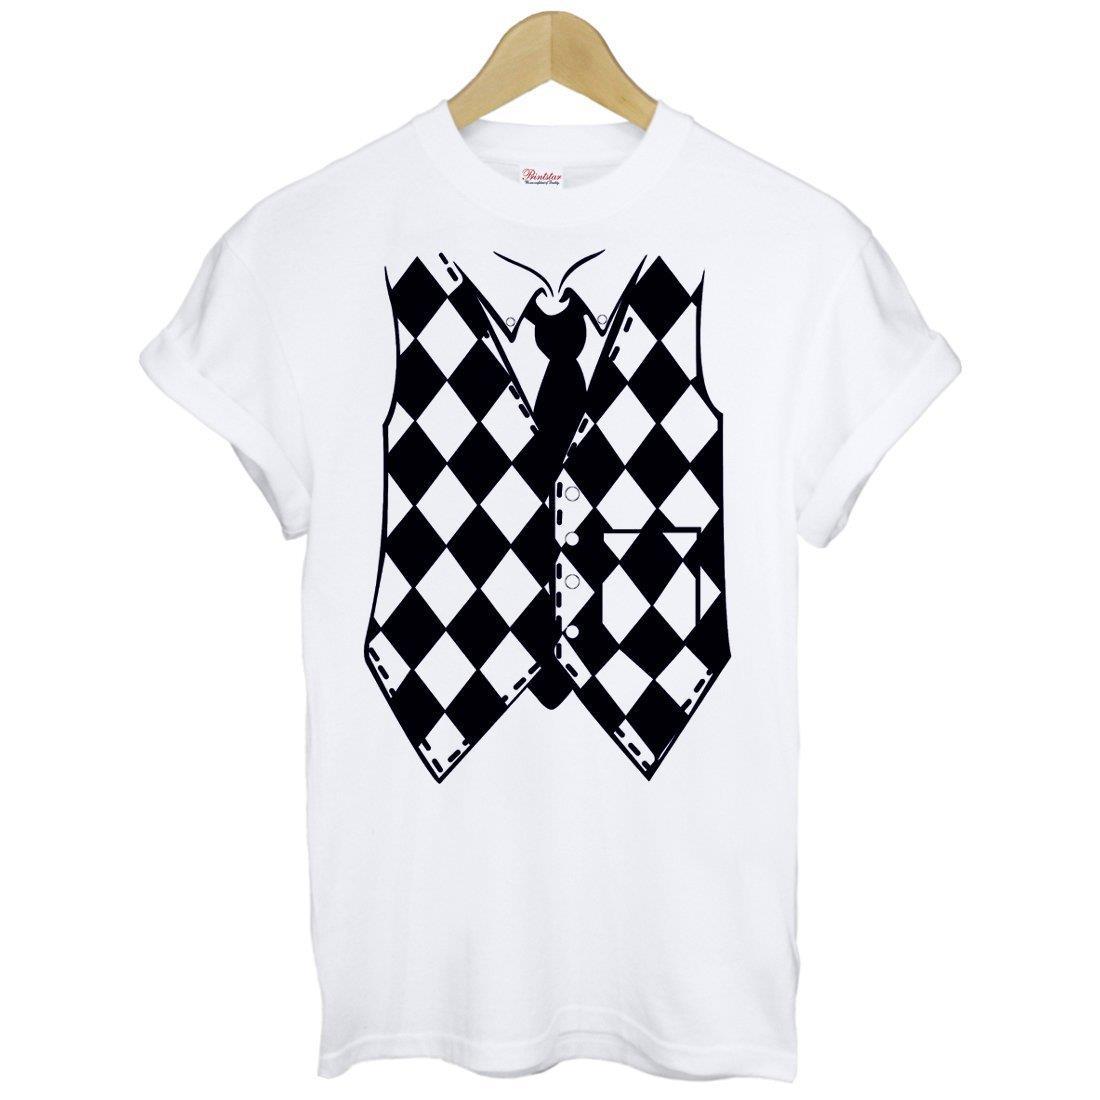 Vest假背心短袖T恤 2色 趣味幽默 攝影照相 潮搖滾性感街頭韓 滑板人物290 gil